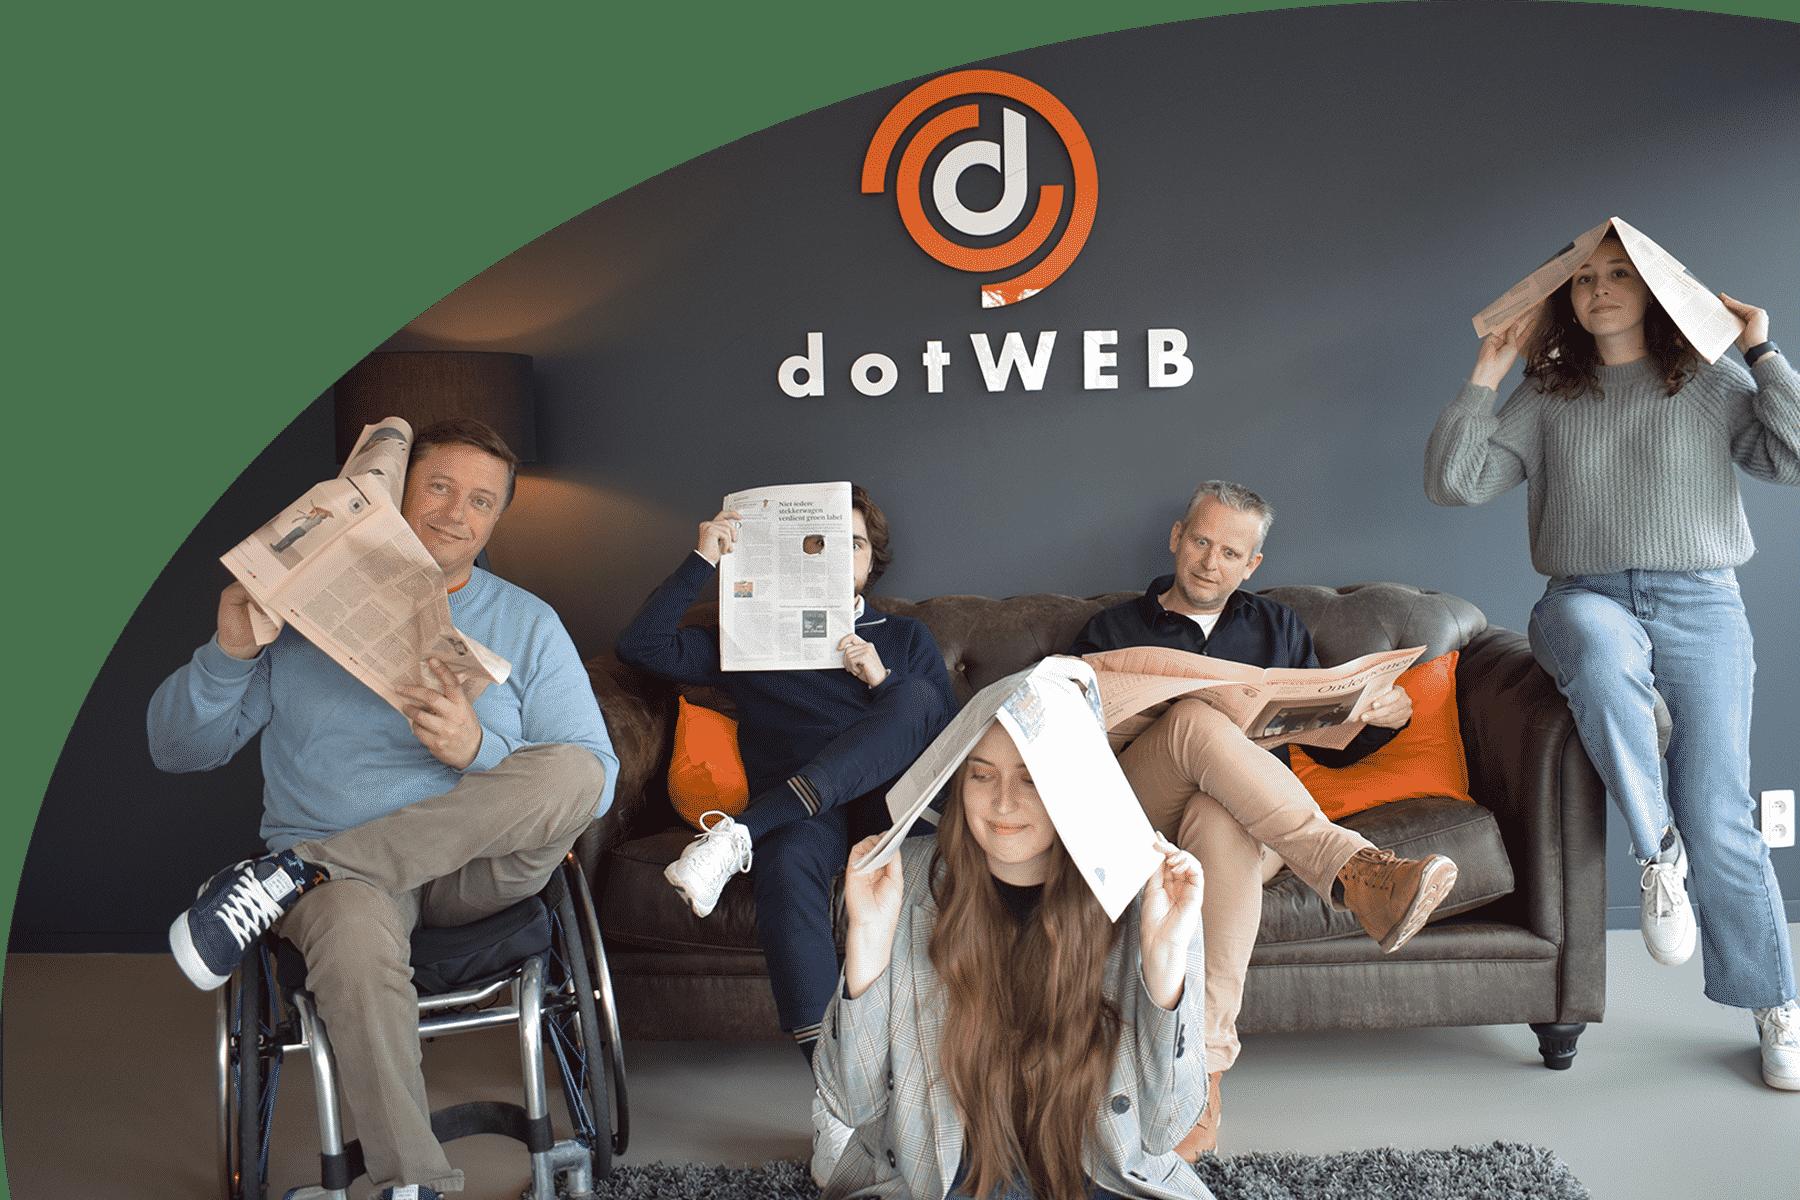 dotweb marketing blog